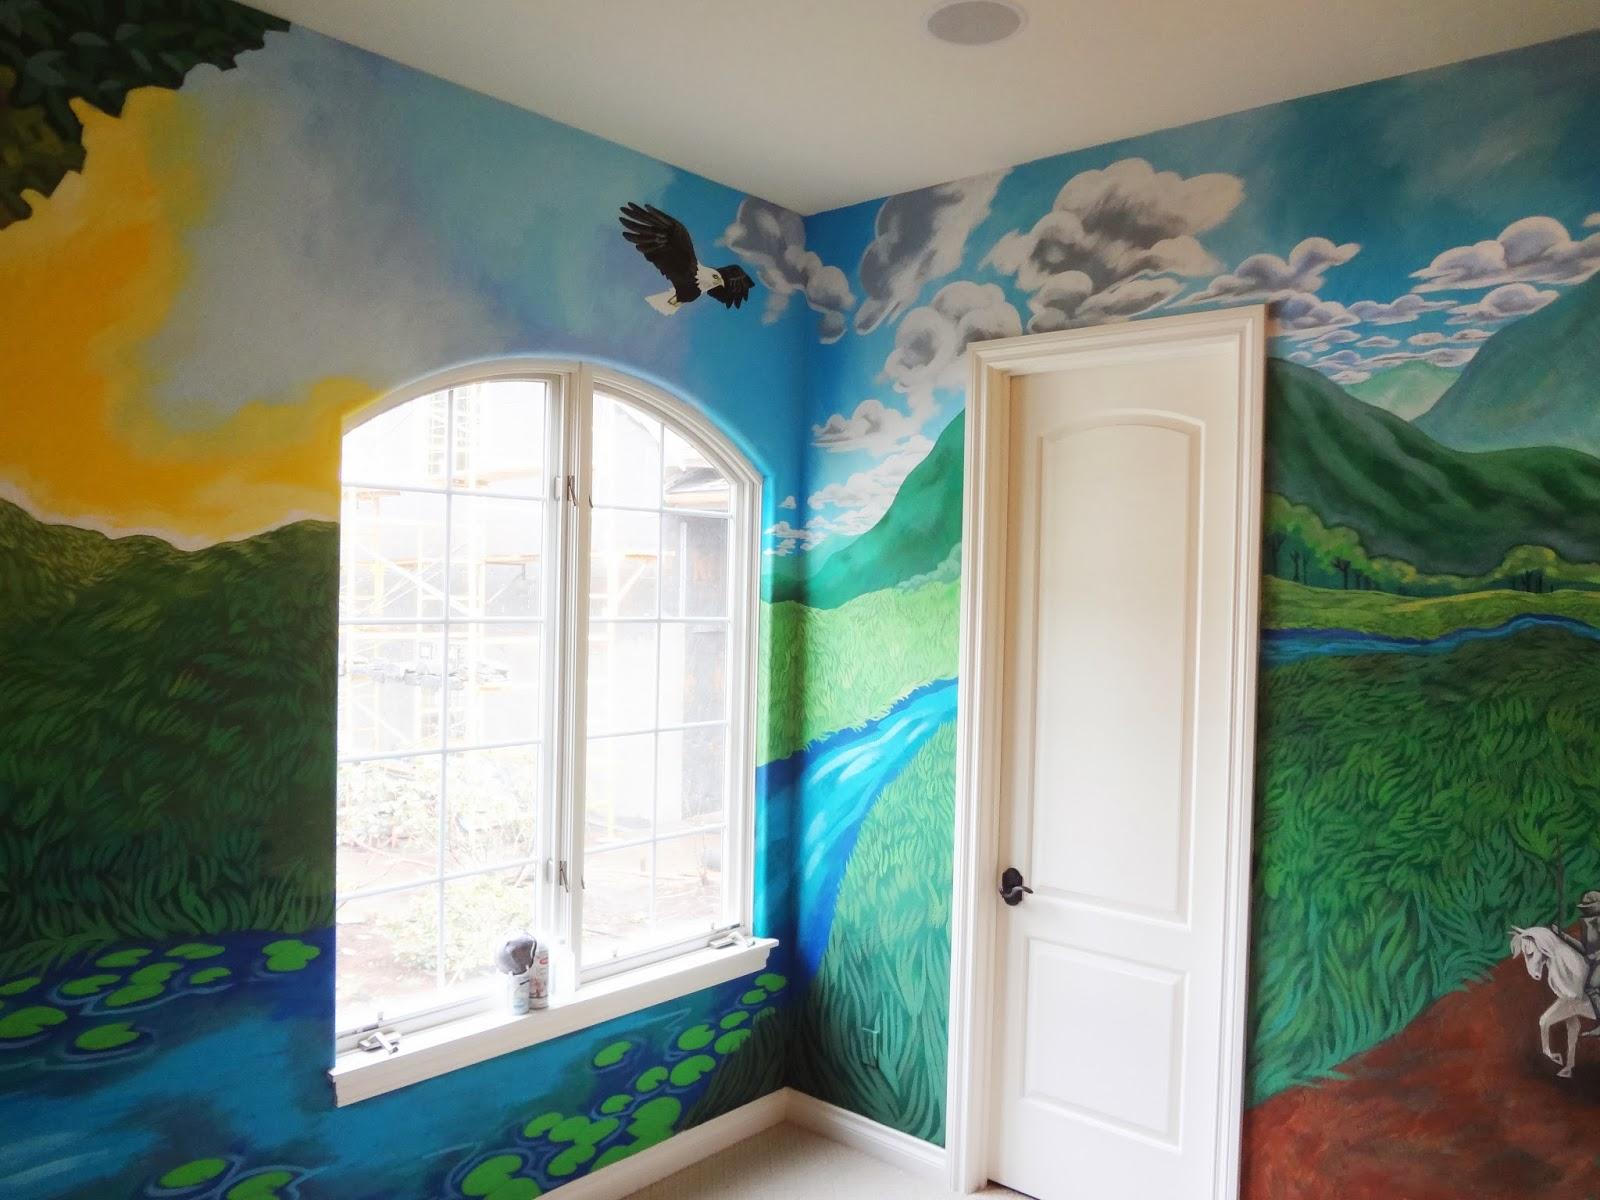 kids forest mural, nursery mural, portland muralist, kids room mural portland, forest mural